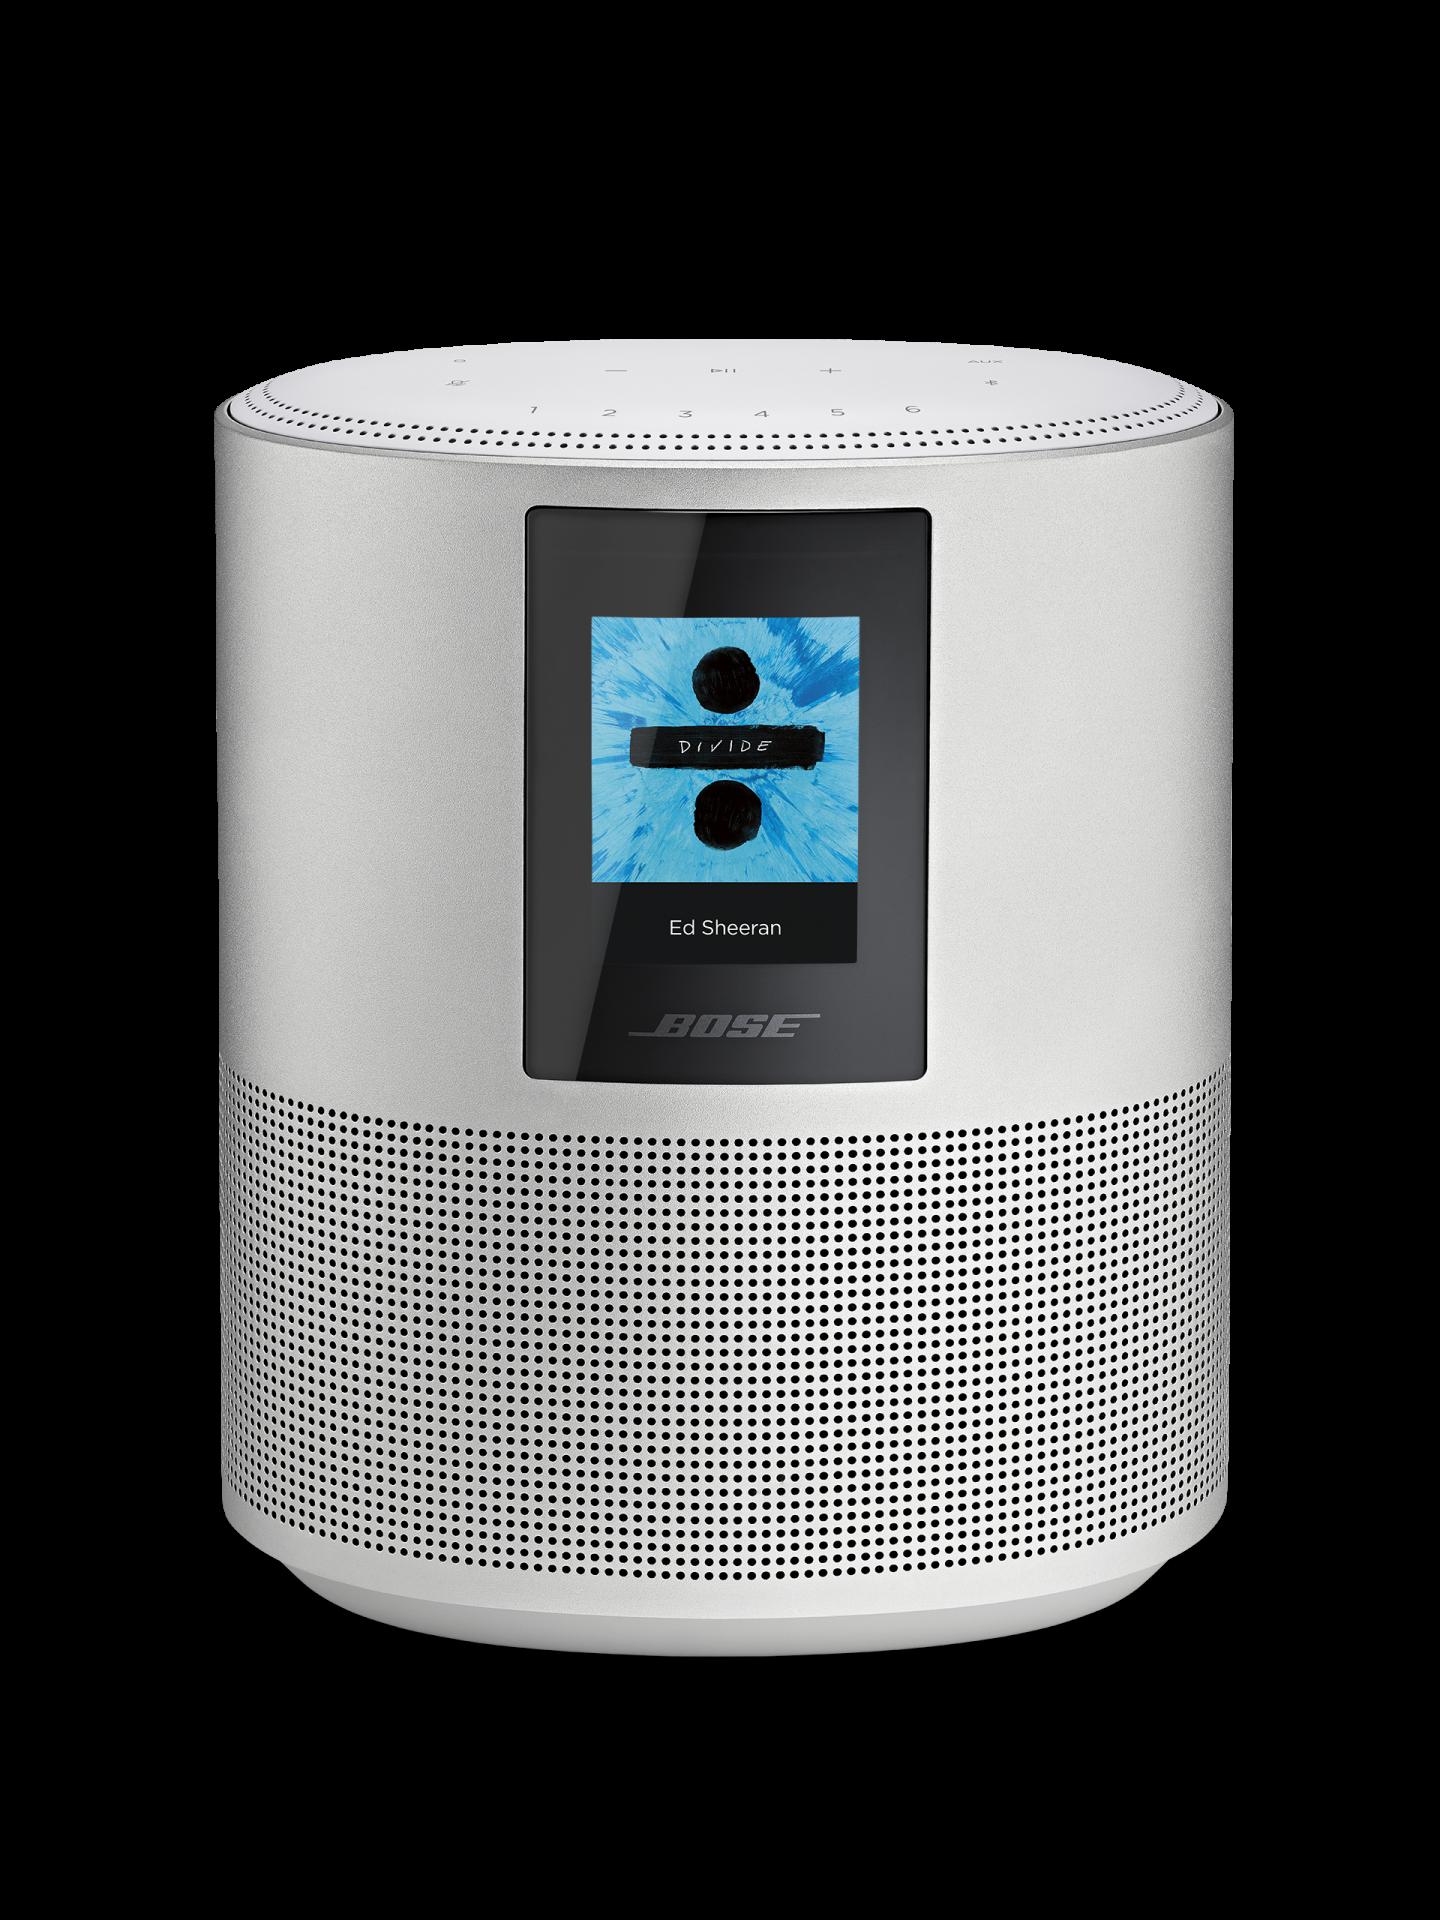 Bose Home Speaker 500 głośnik inteligentny